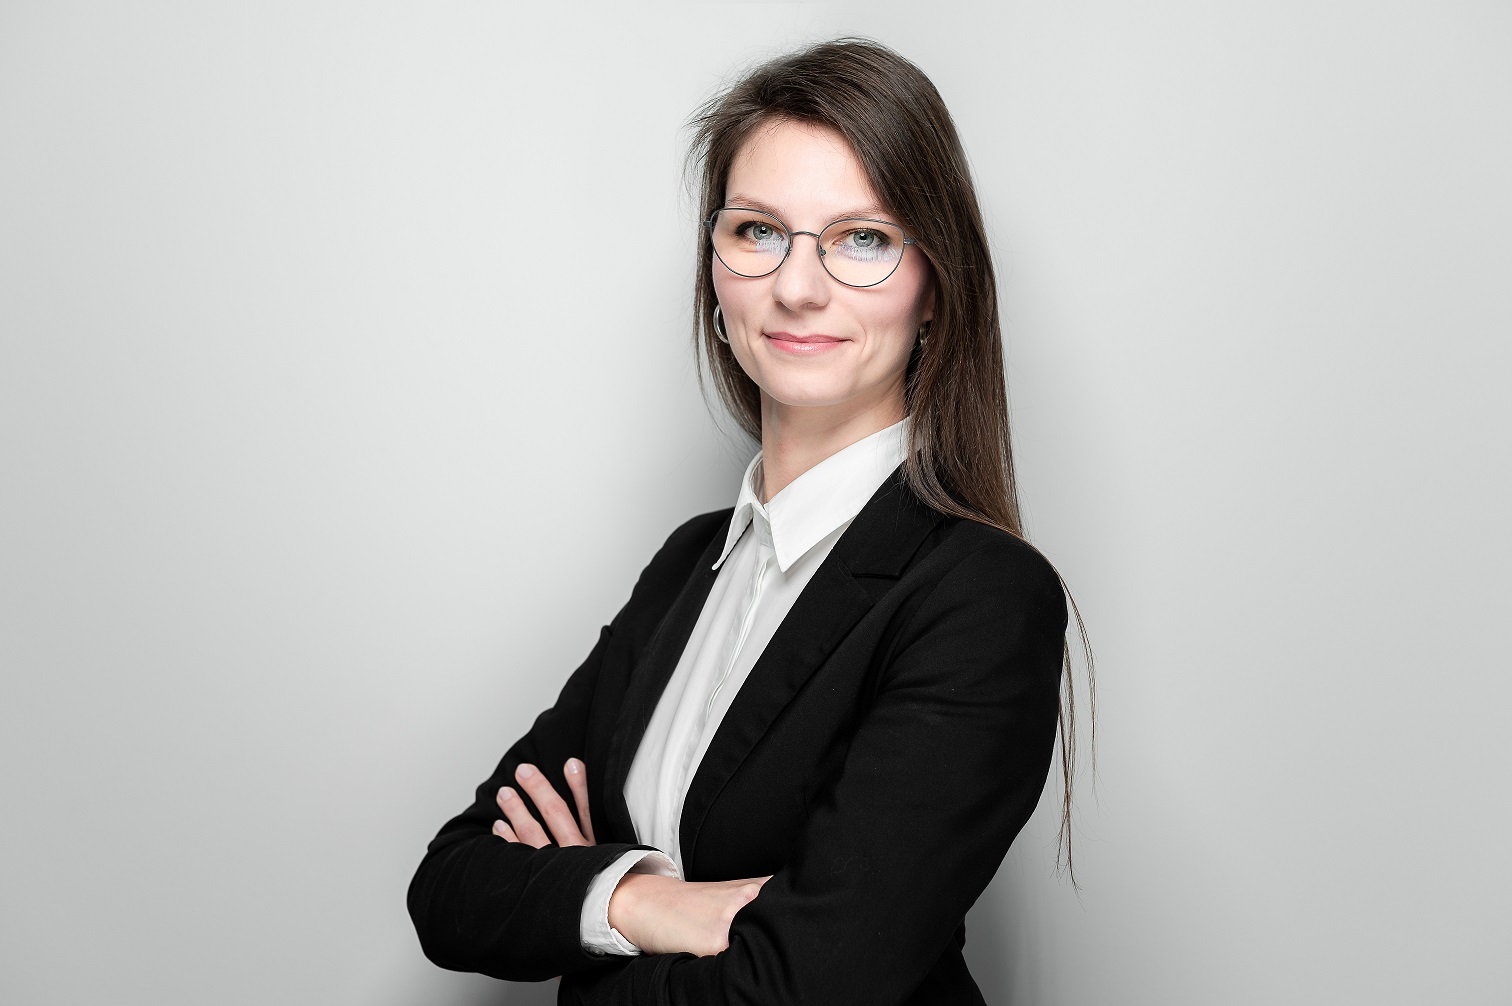 Alicja Ziółek